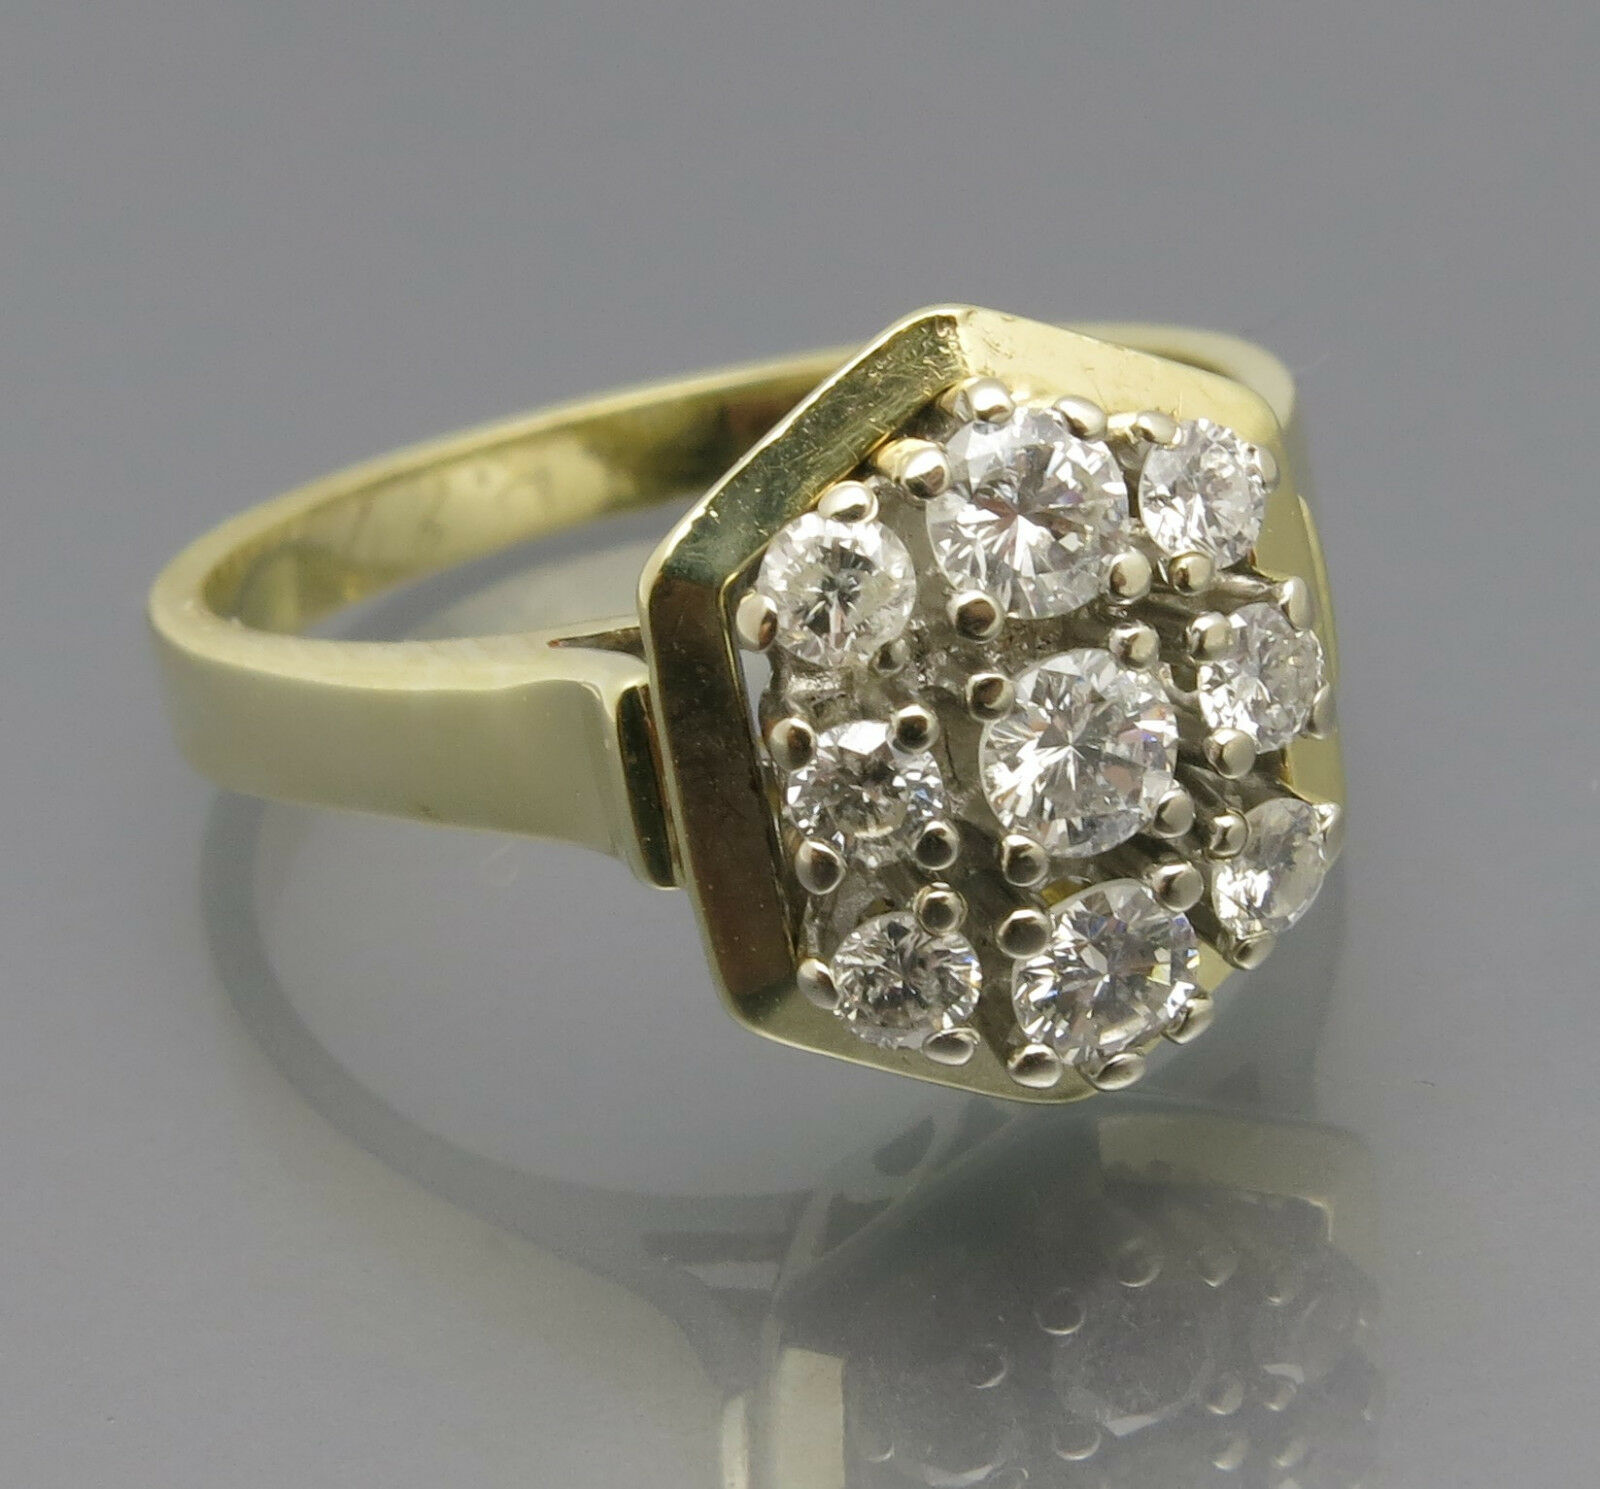 clpr Handmade Diamond Engagement Ring 3.34 Ct Diamond Sterling Silver Ring